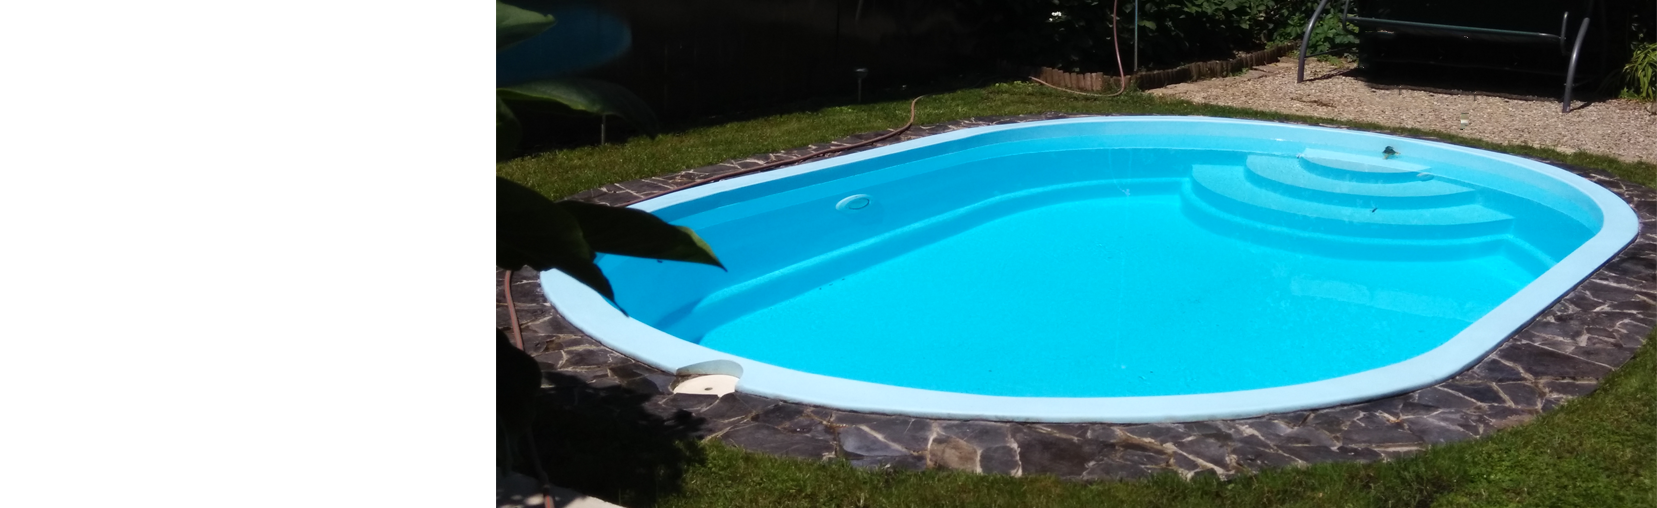 piscina-ovala